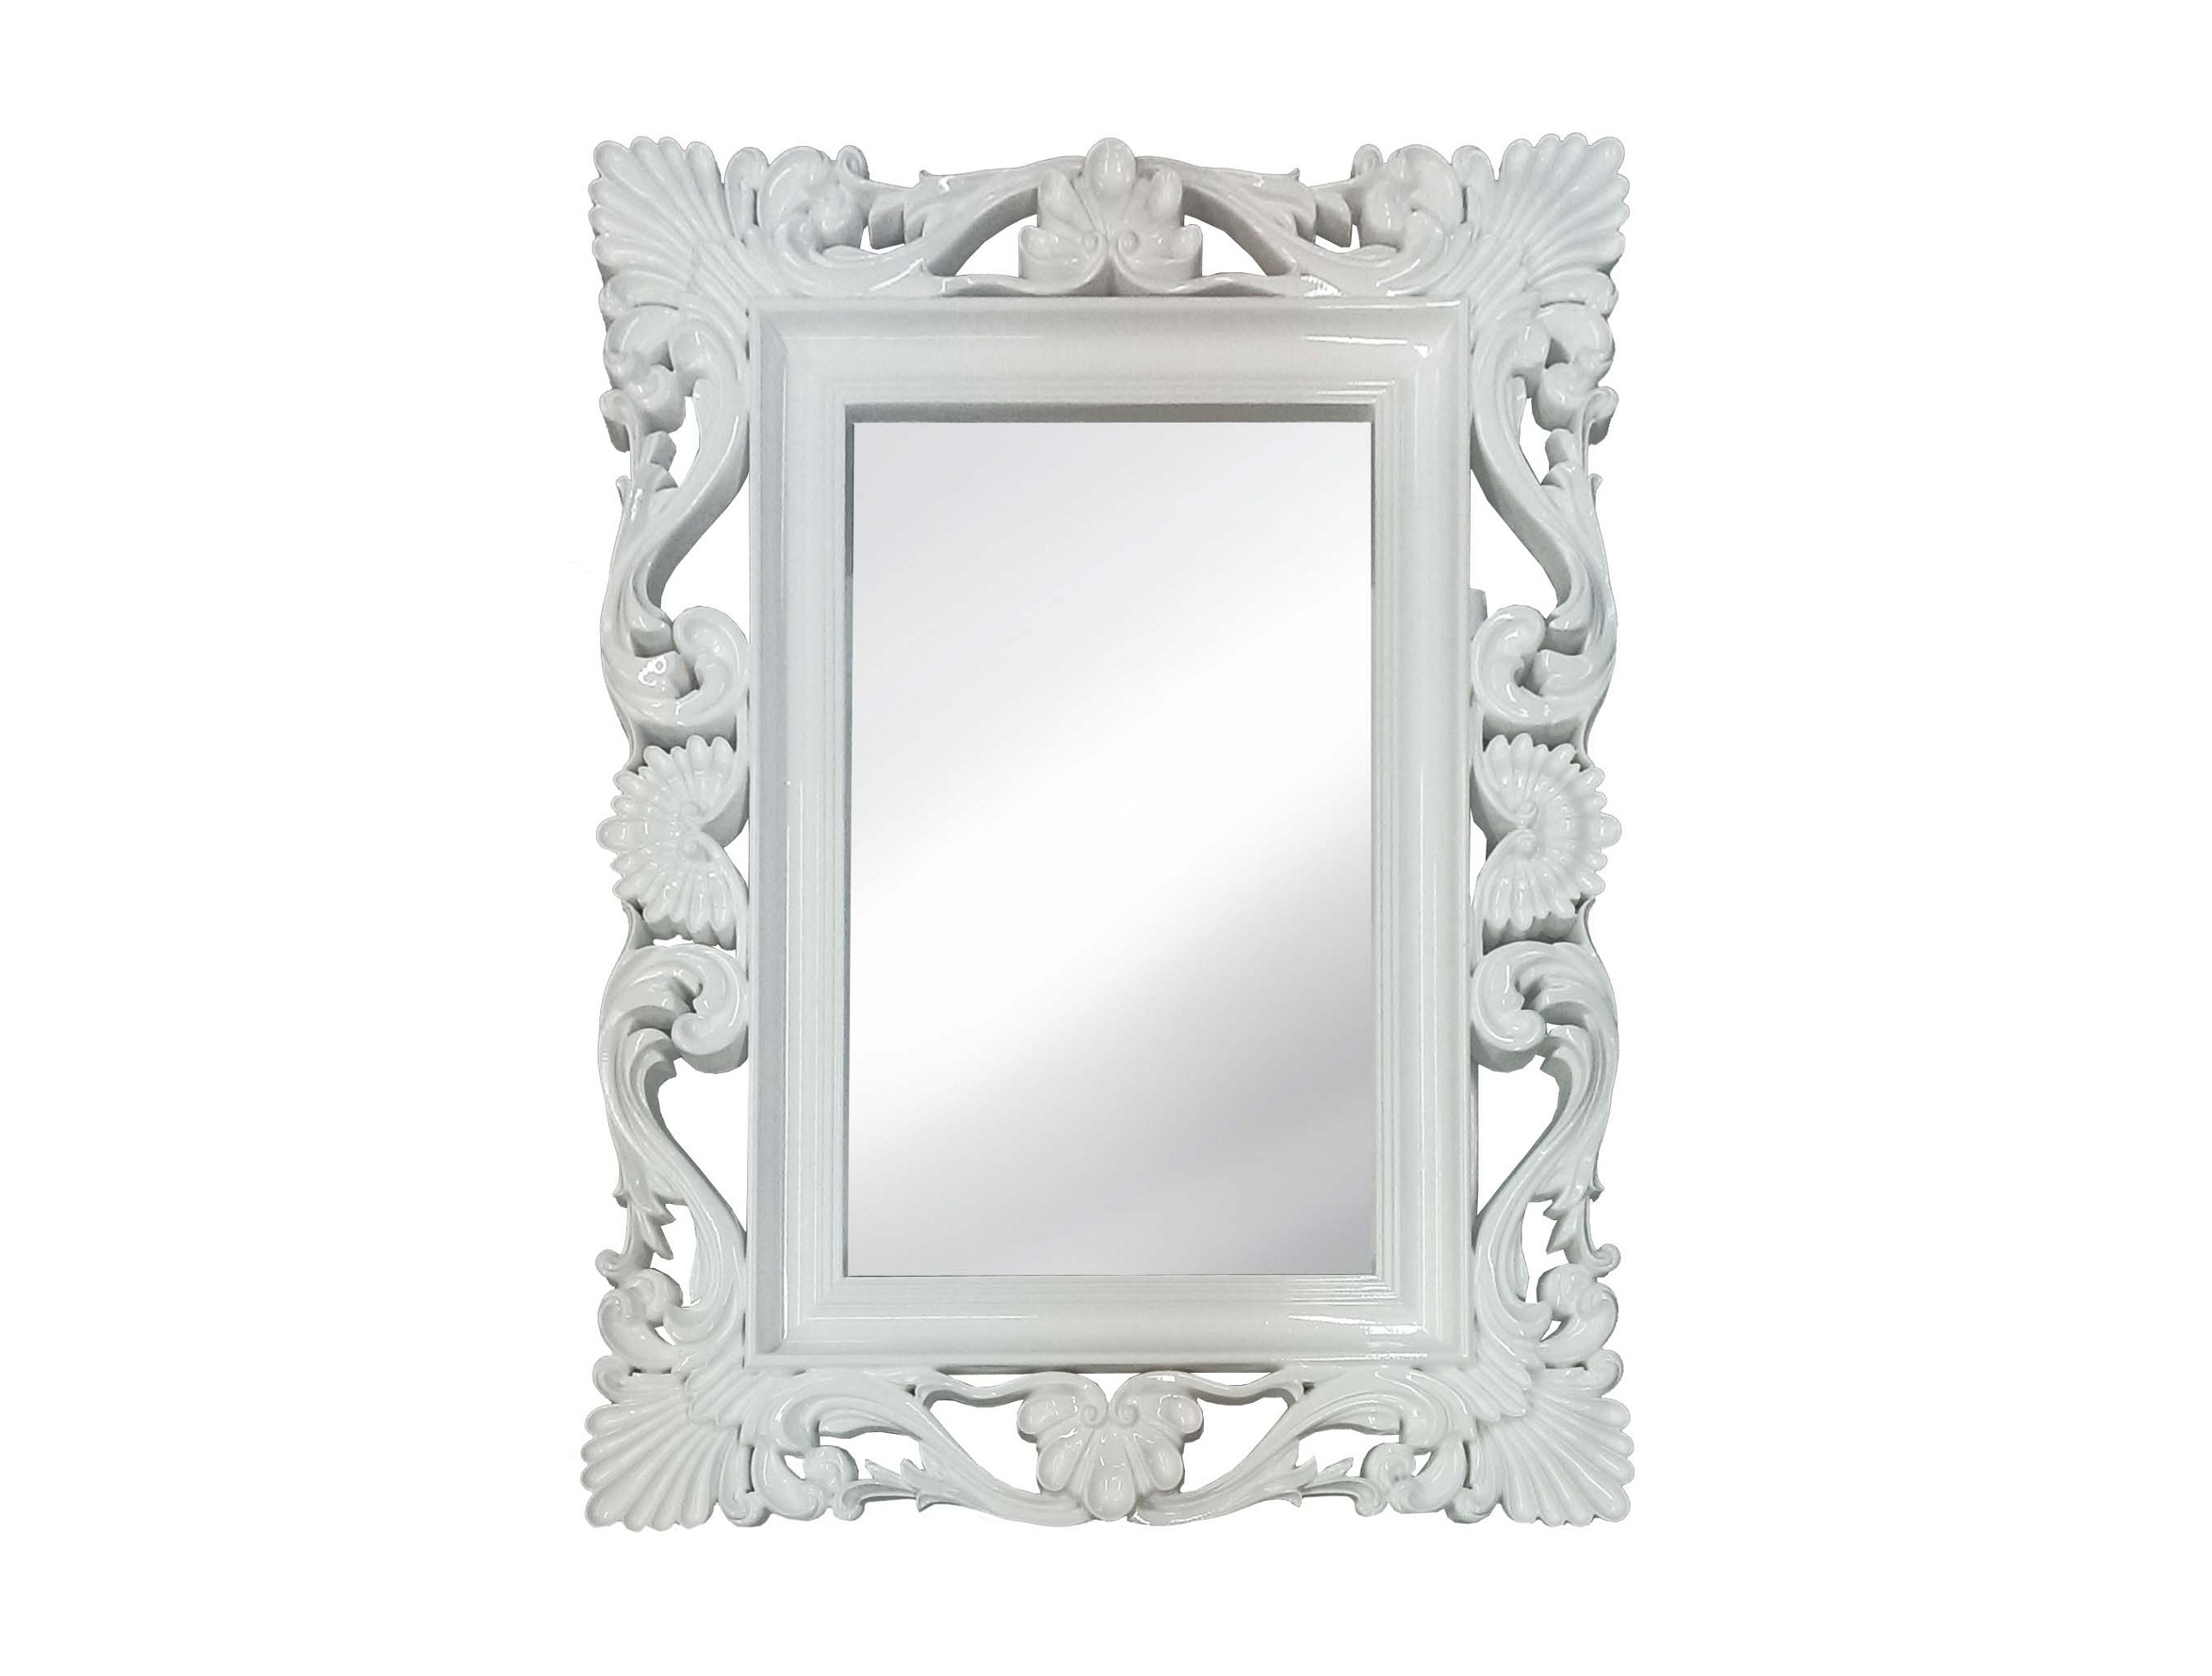 Зеркало Reeforma 15432728 от thefurnish